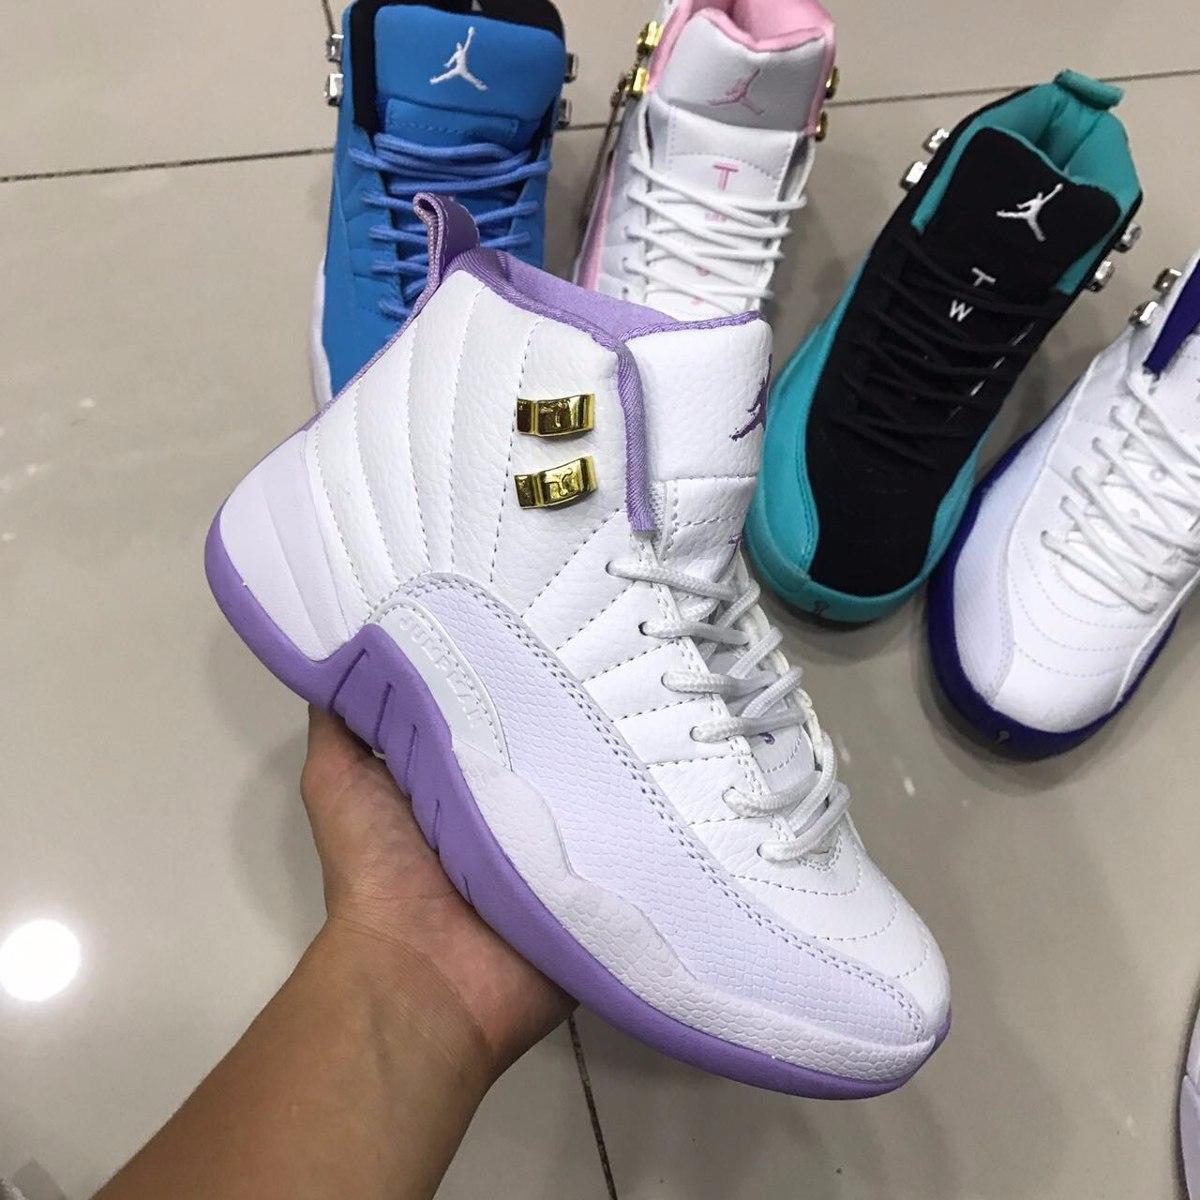 9bf47cbc21 Botines Botines Botines 2017 205 Jordan Nike 000 En Dama Retro Mercado  Botas TUBdXqT